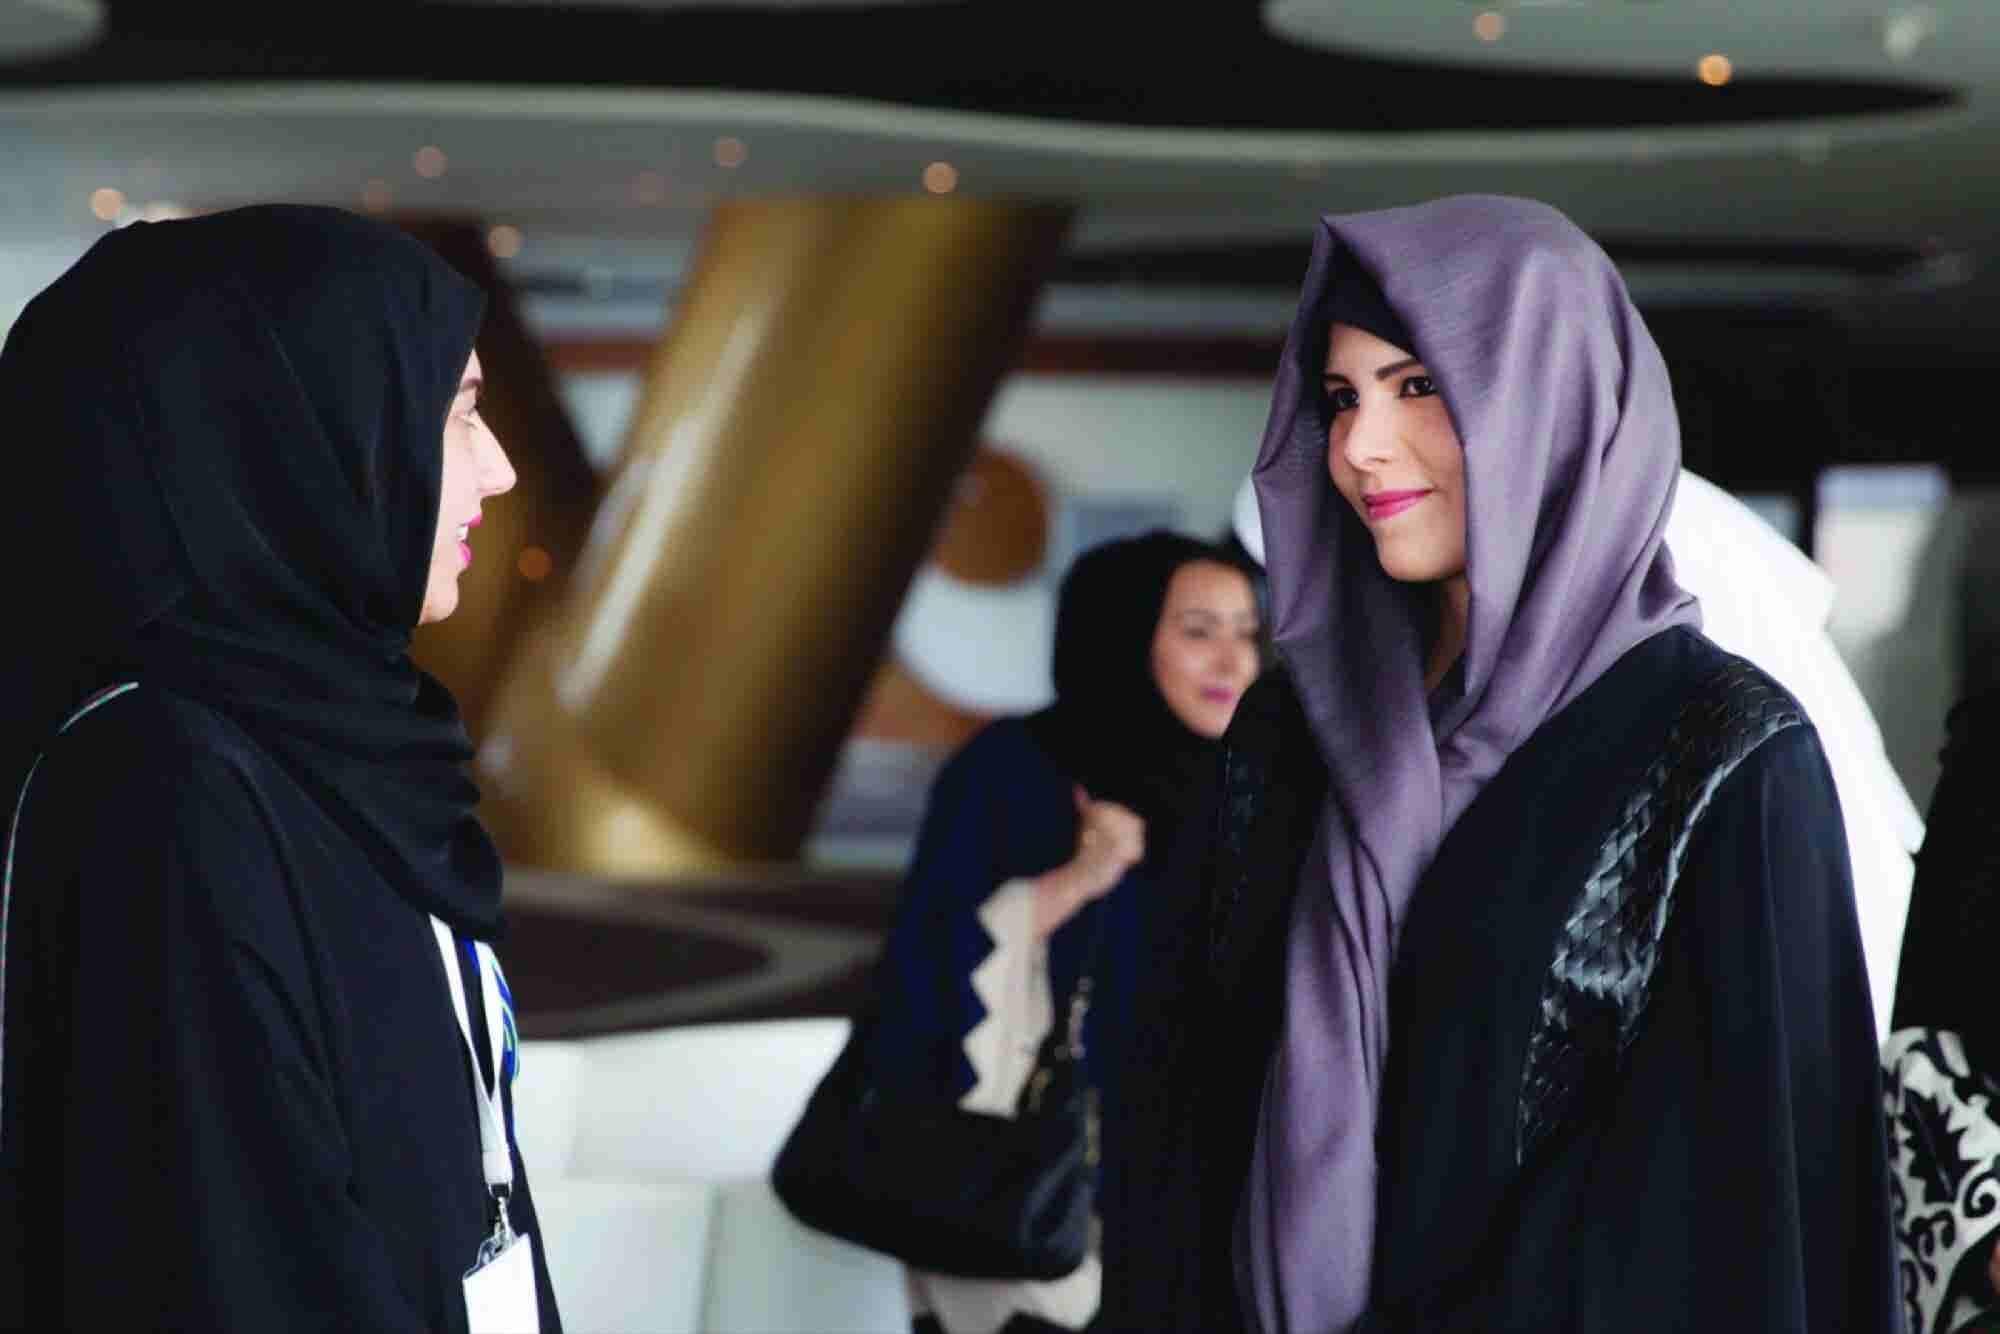 HH Sheikha Latifa Bint Mohammed Al Maktoum: Dubai Culture Wants Creative Entrepreneurs To Go Global